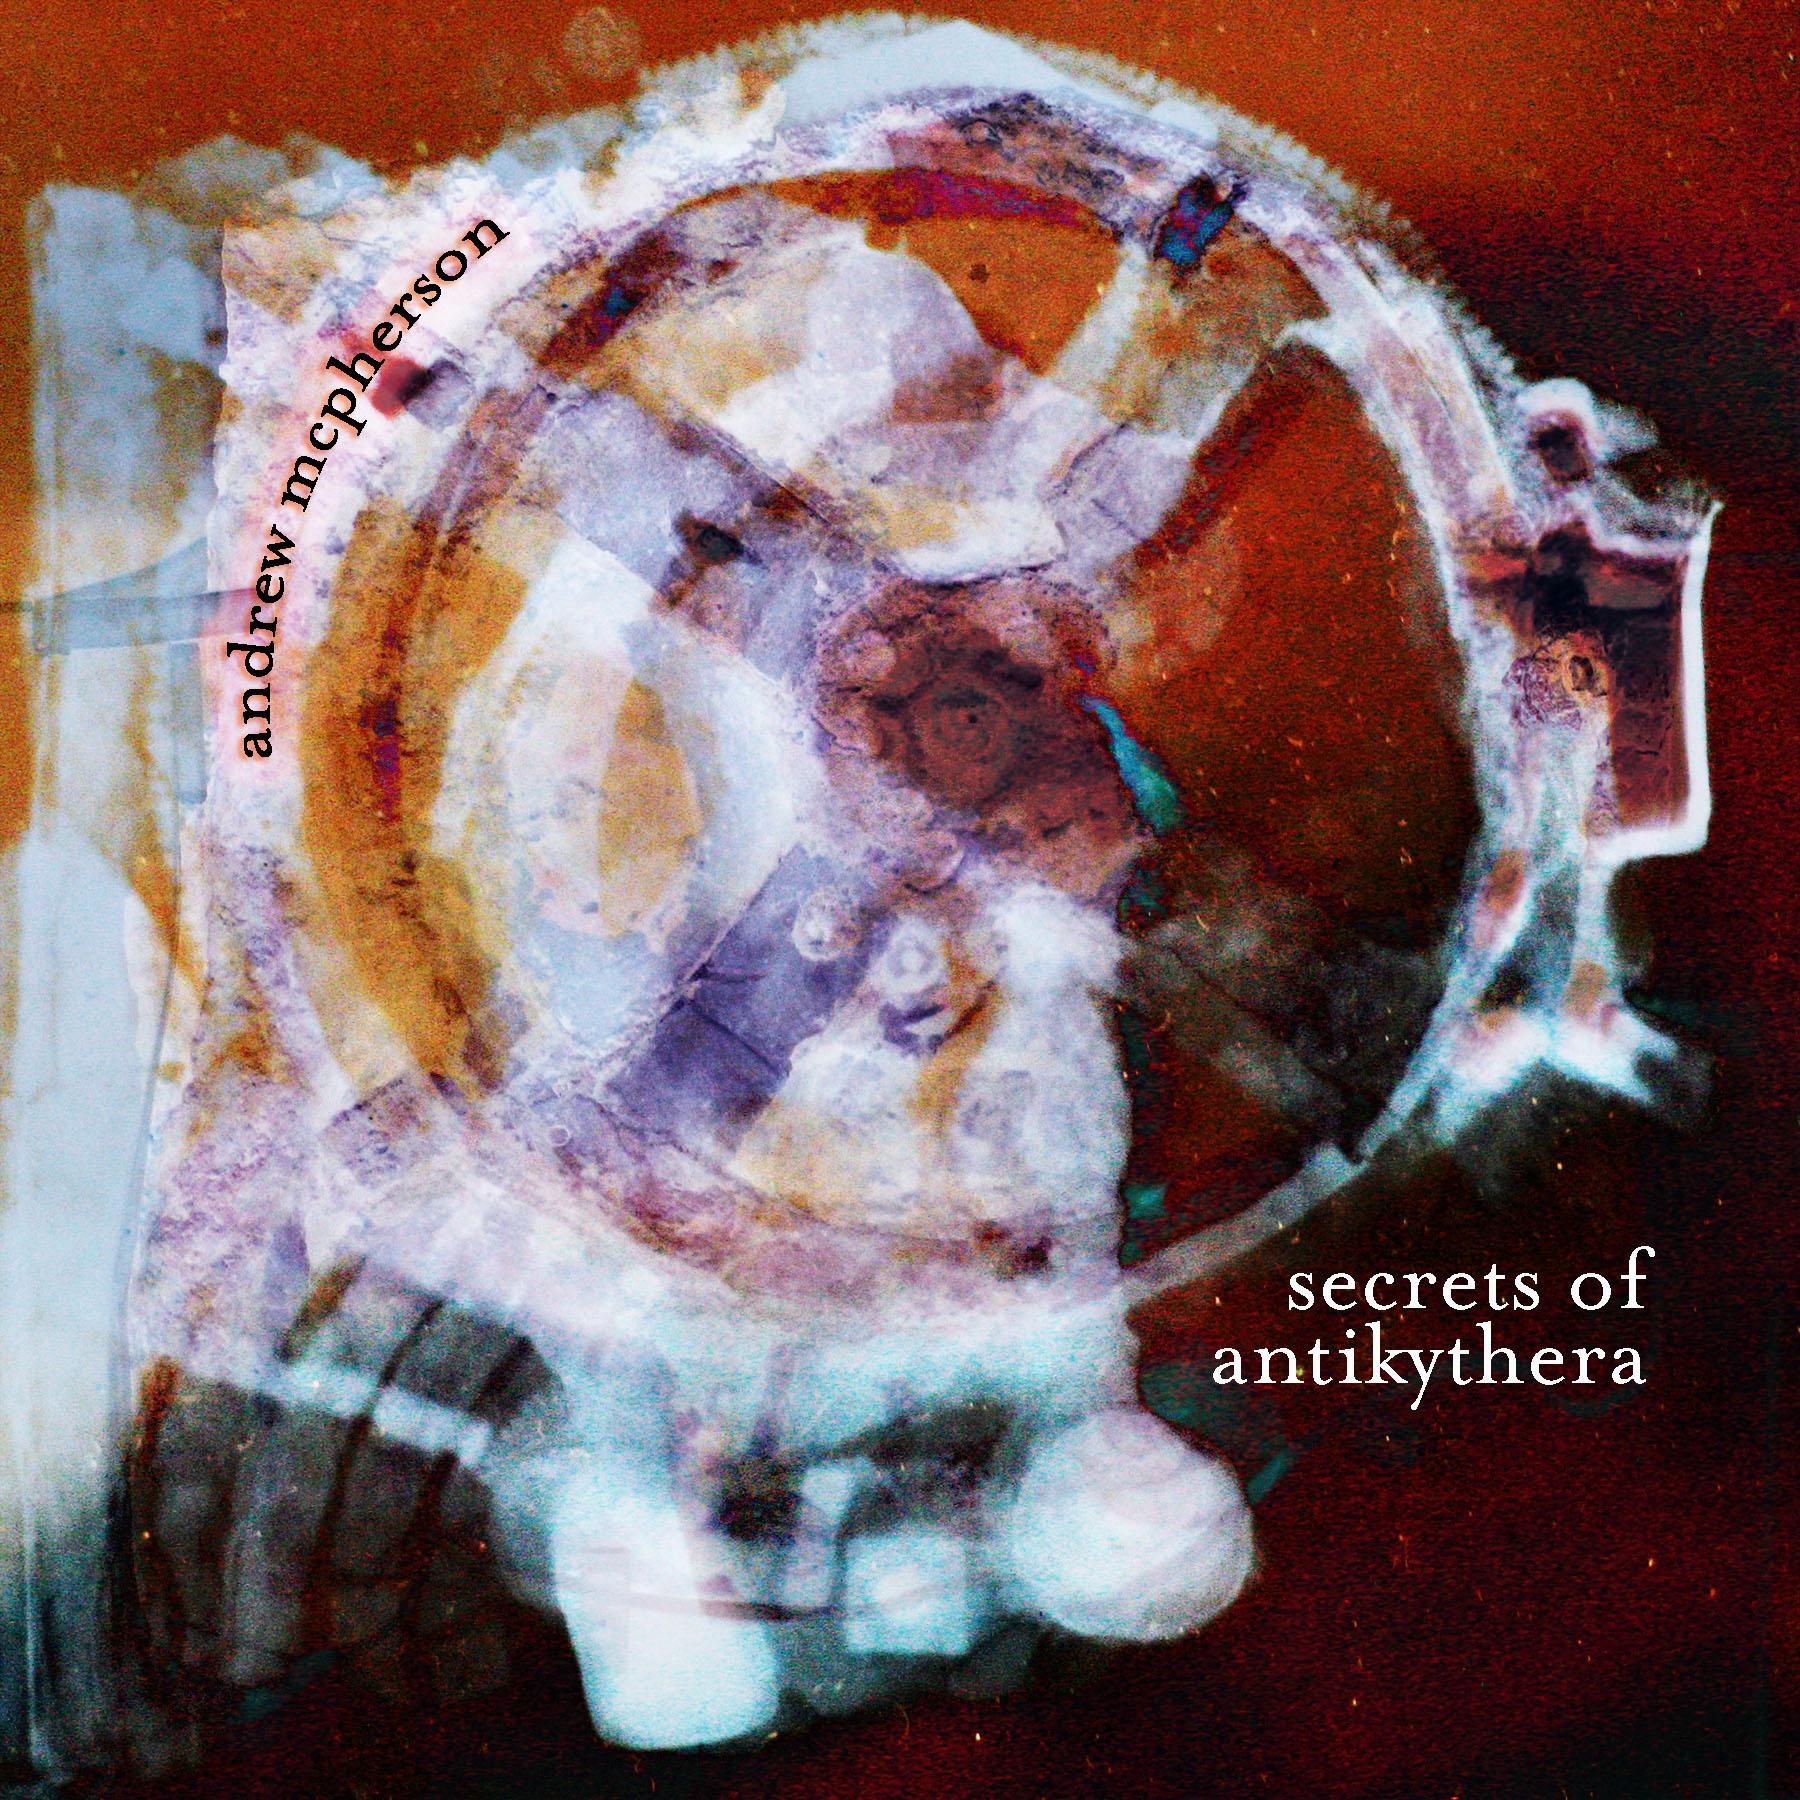 Secrets of Antikythera.jpg